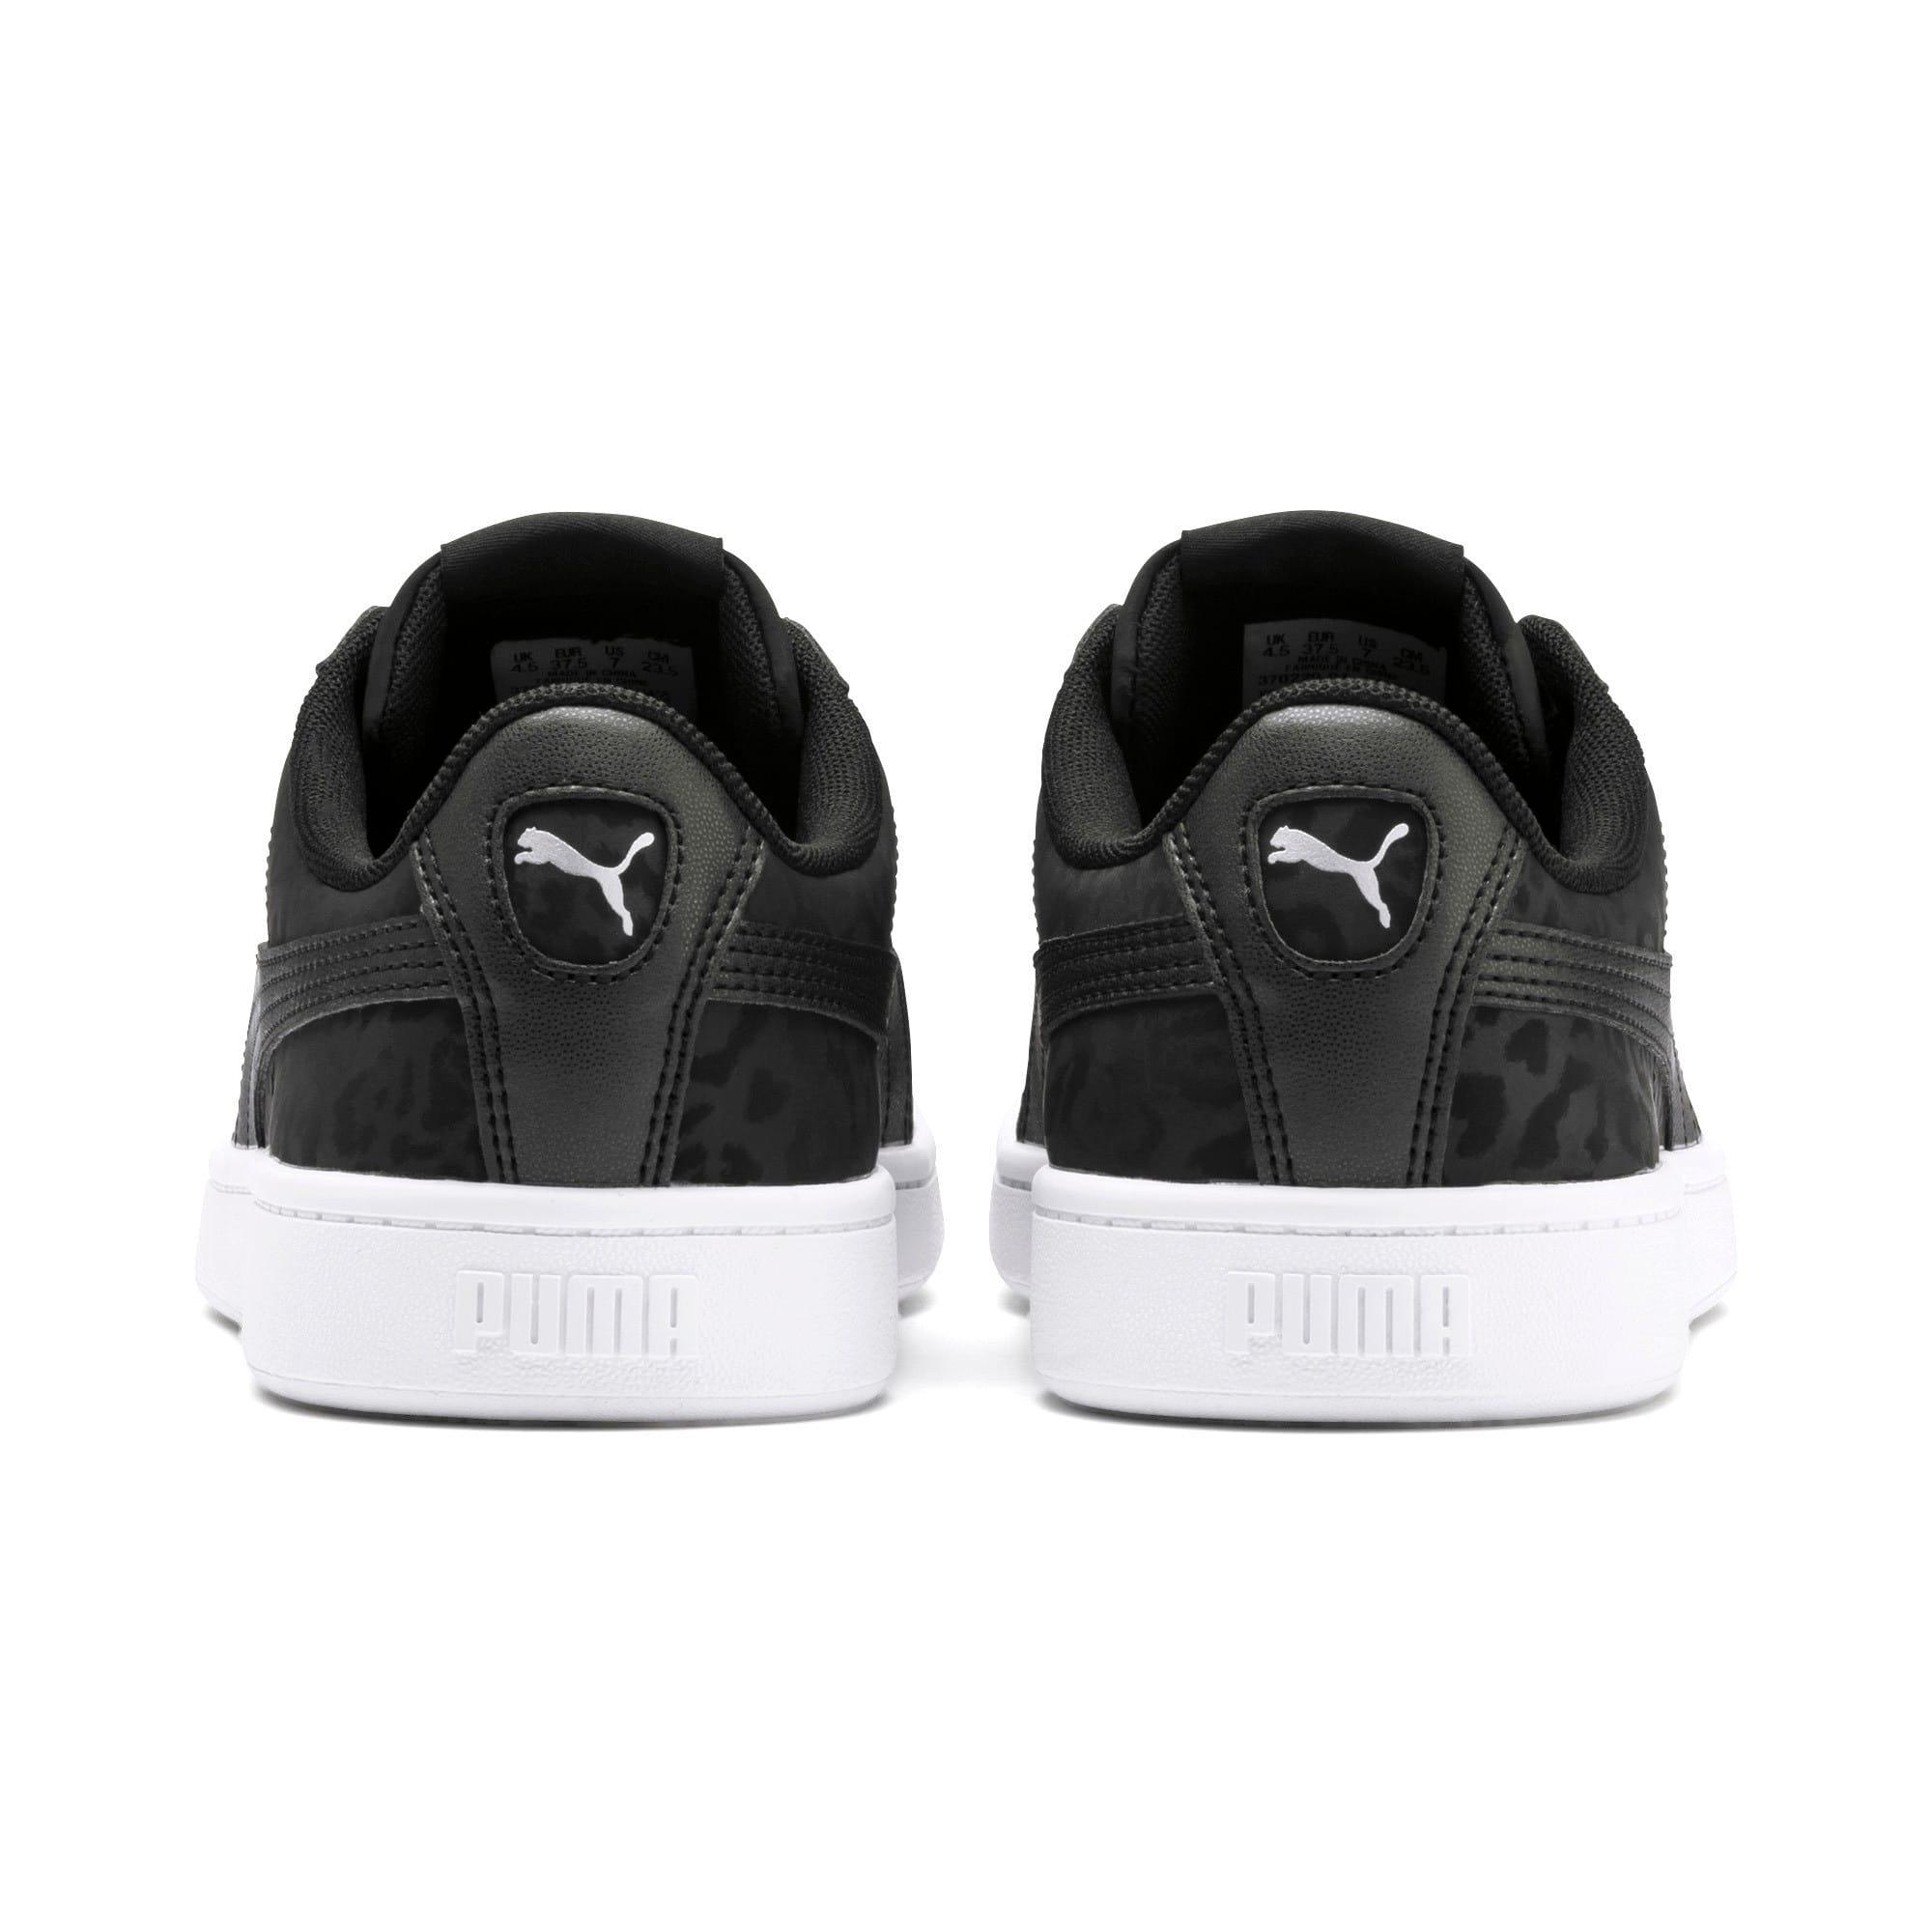 Thumbnail 4 of PUMA Vikky v2 Wildcat Women's Sneakers, Puma Black-Puma Silver-White, medium